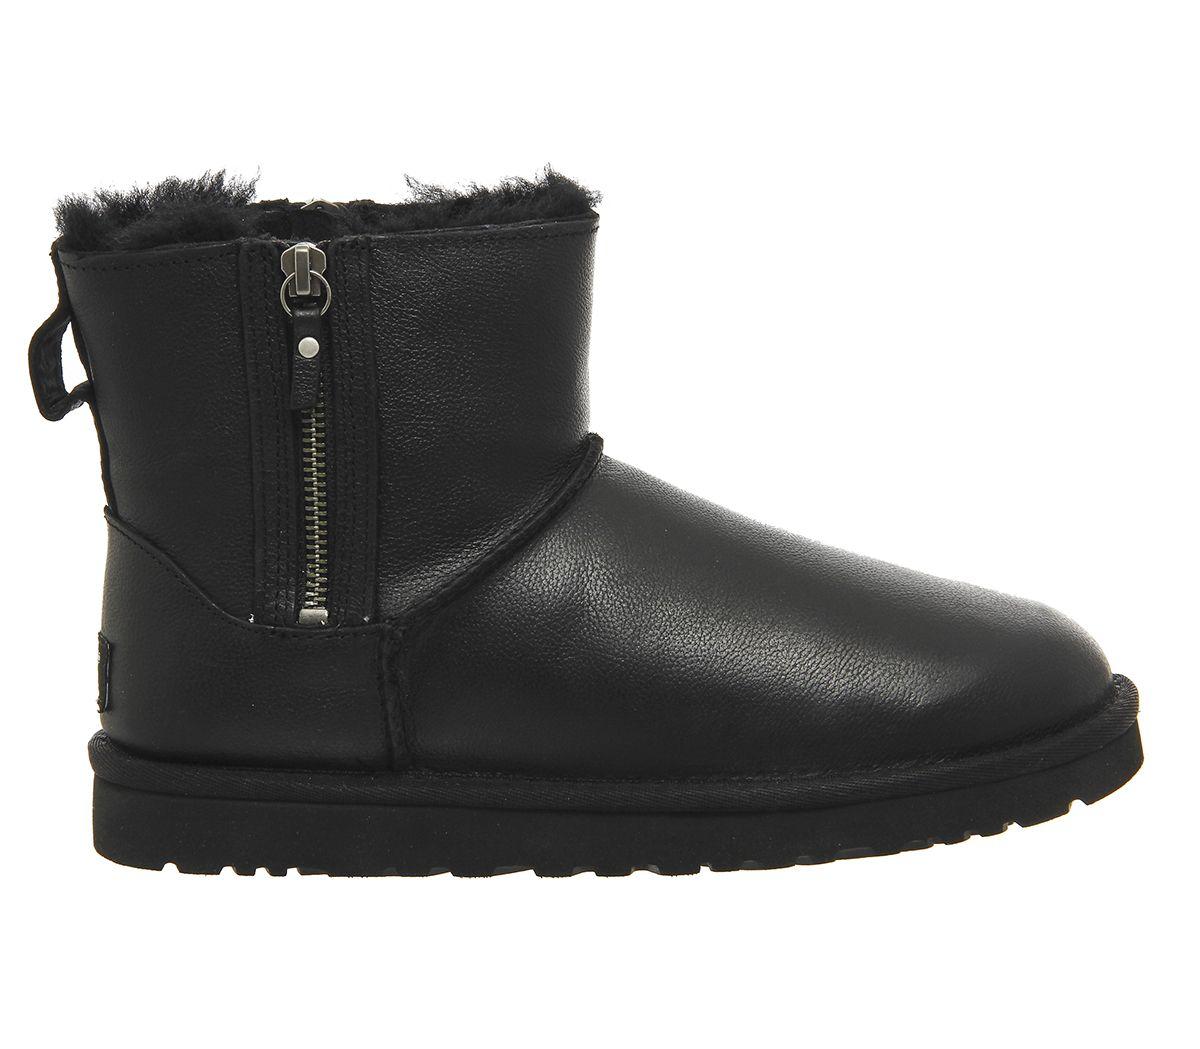 be41f527028 Classic Mini Double Zip | Shopping | Ugg classic mini, Black leather ...